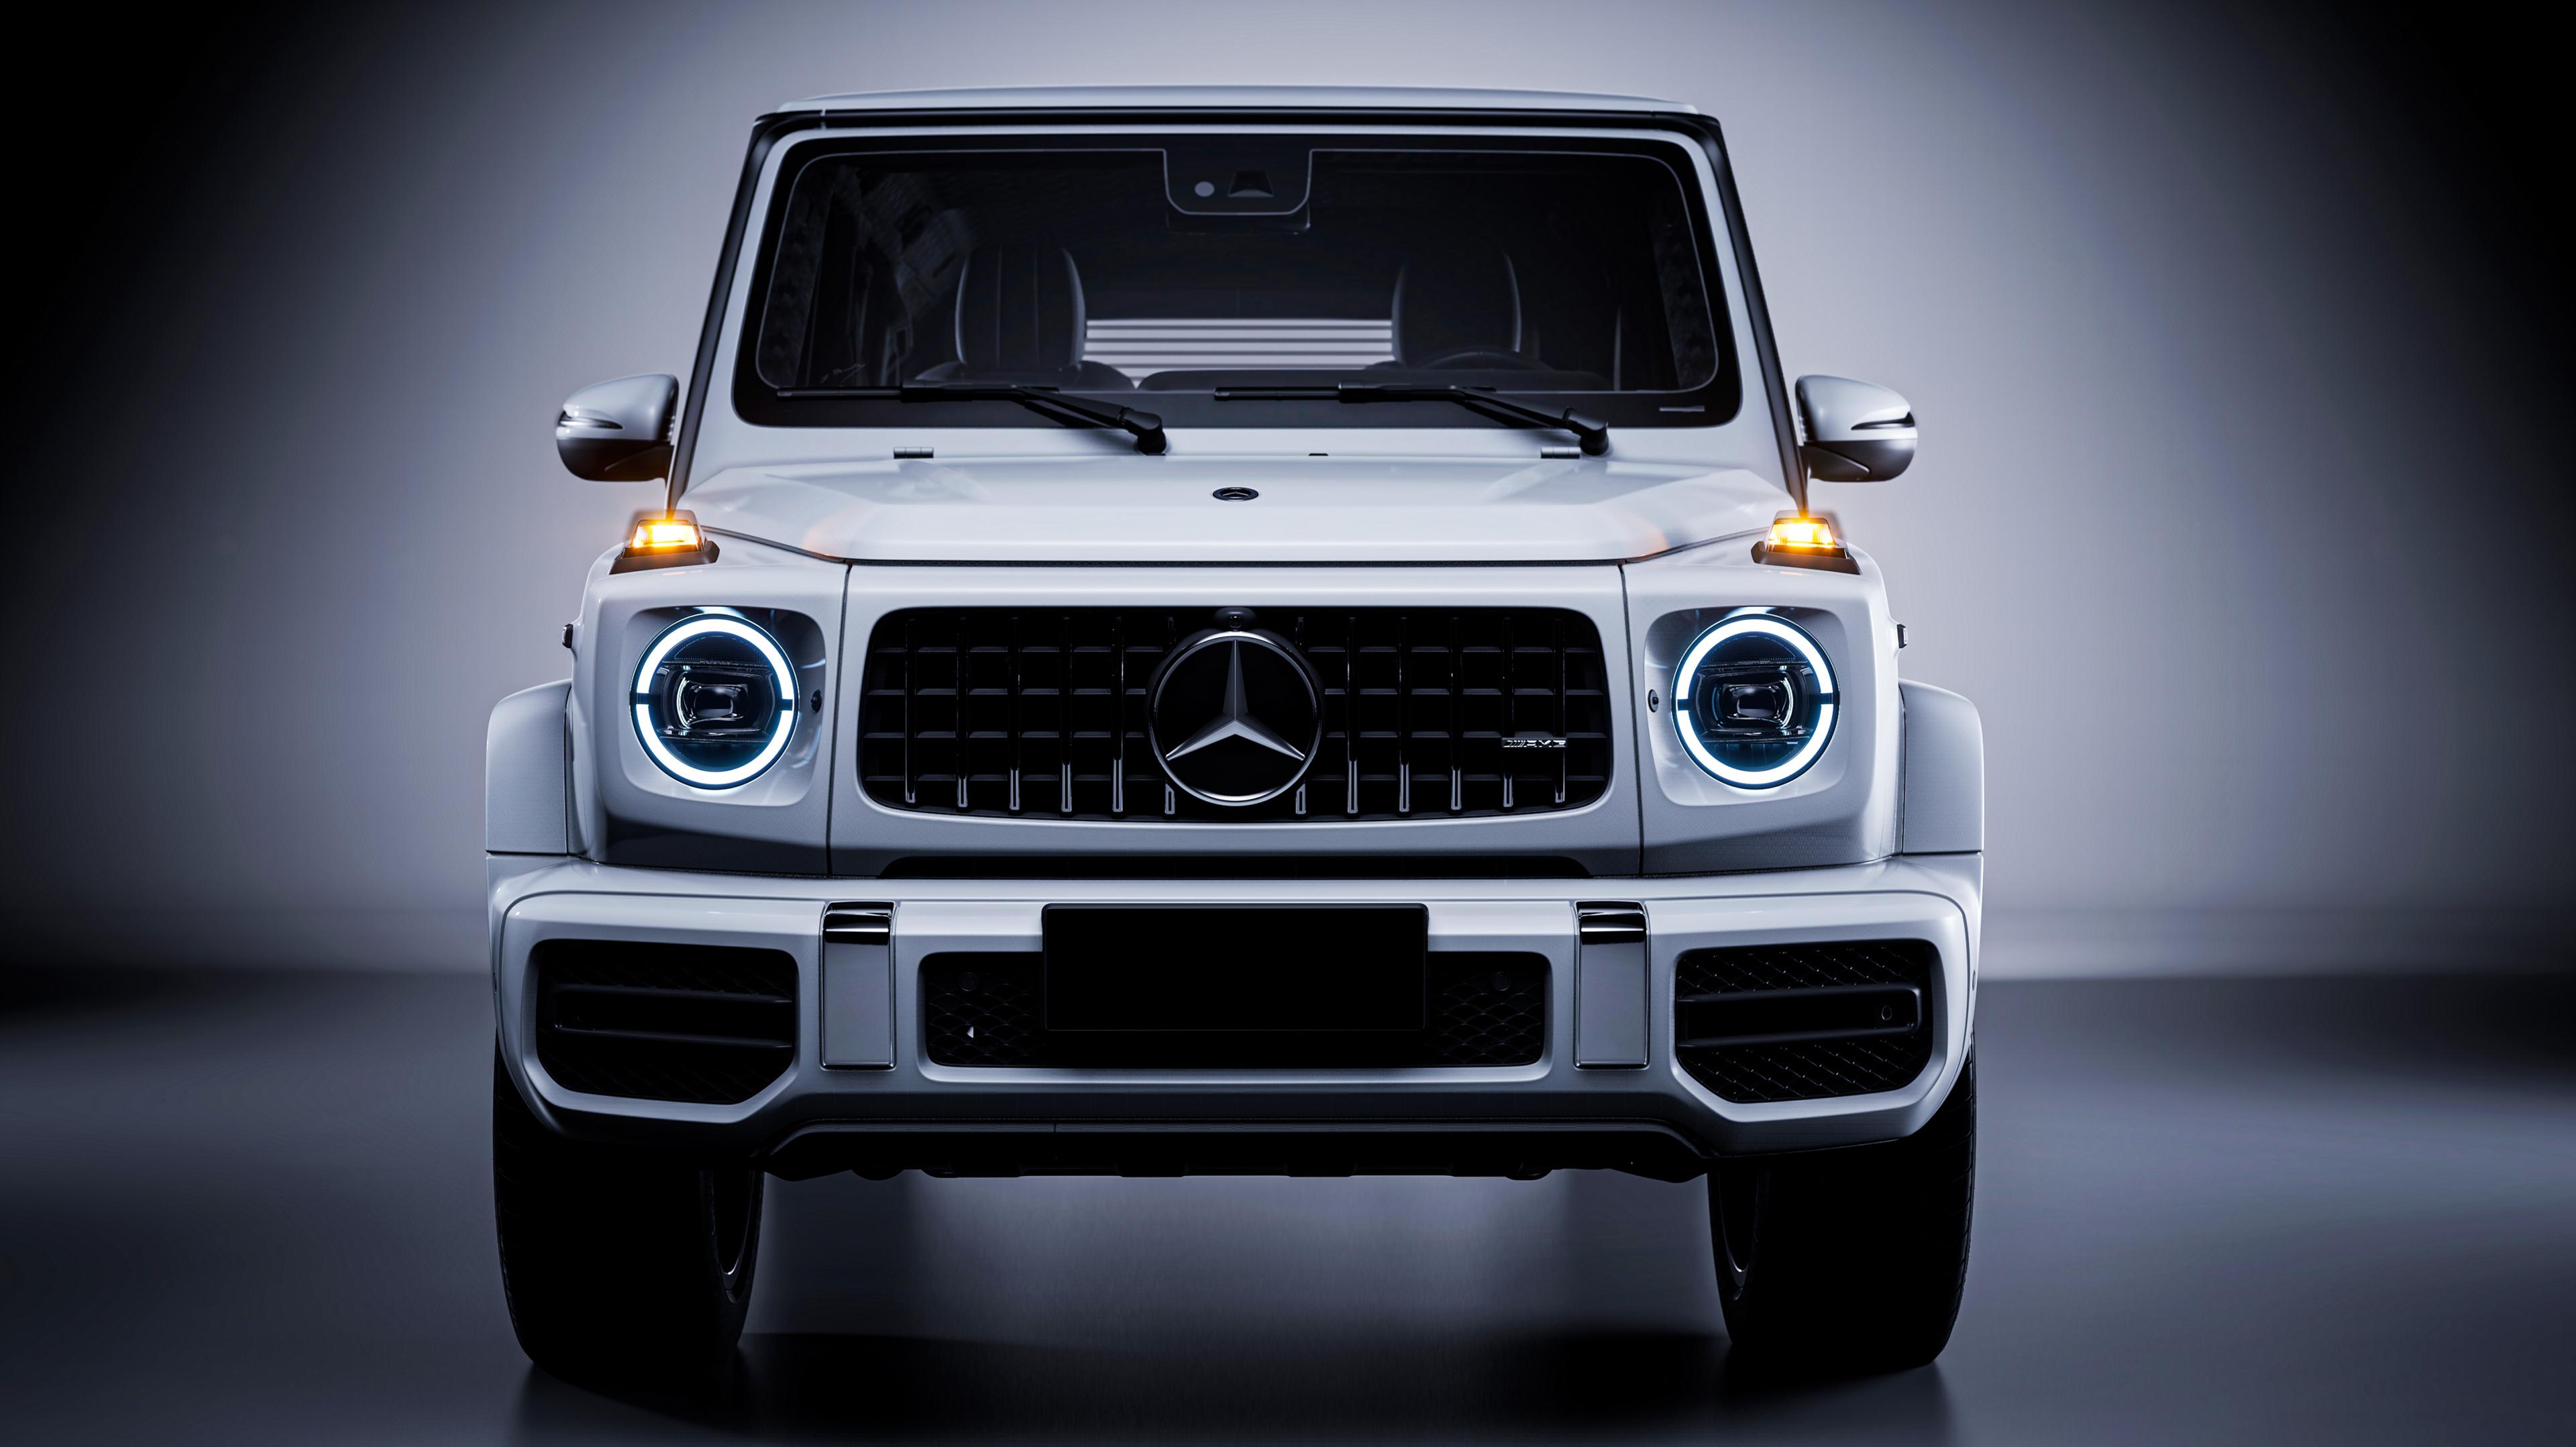 mercedes benz g 63 white 4k 1608910461 - Mercedes Benz G 63 White 4k - Mercedes Benz G 63 White 4k wallpapers